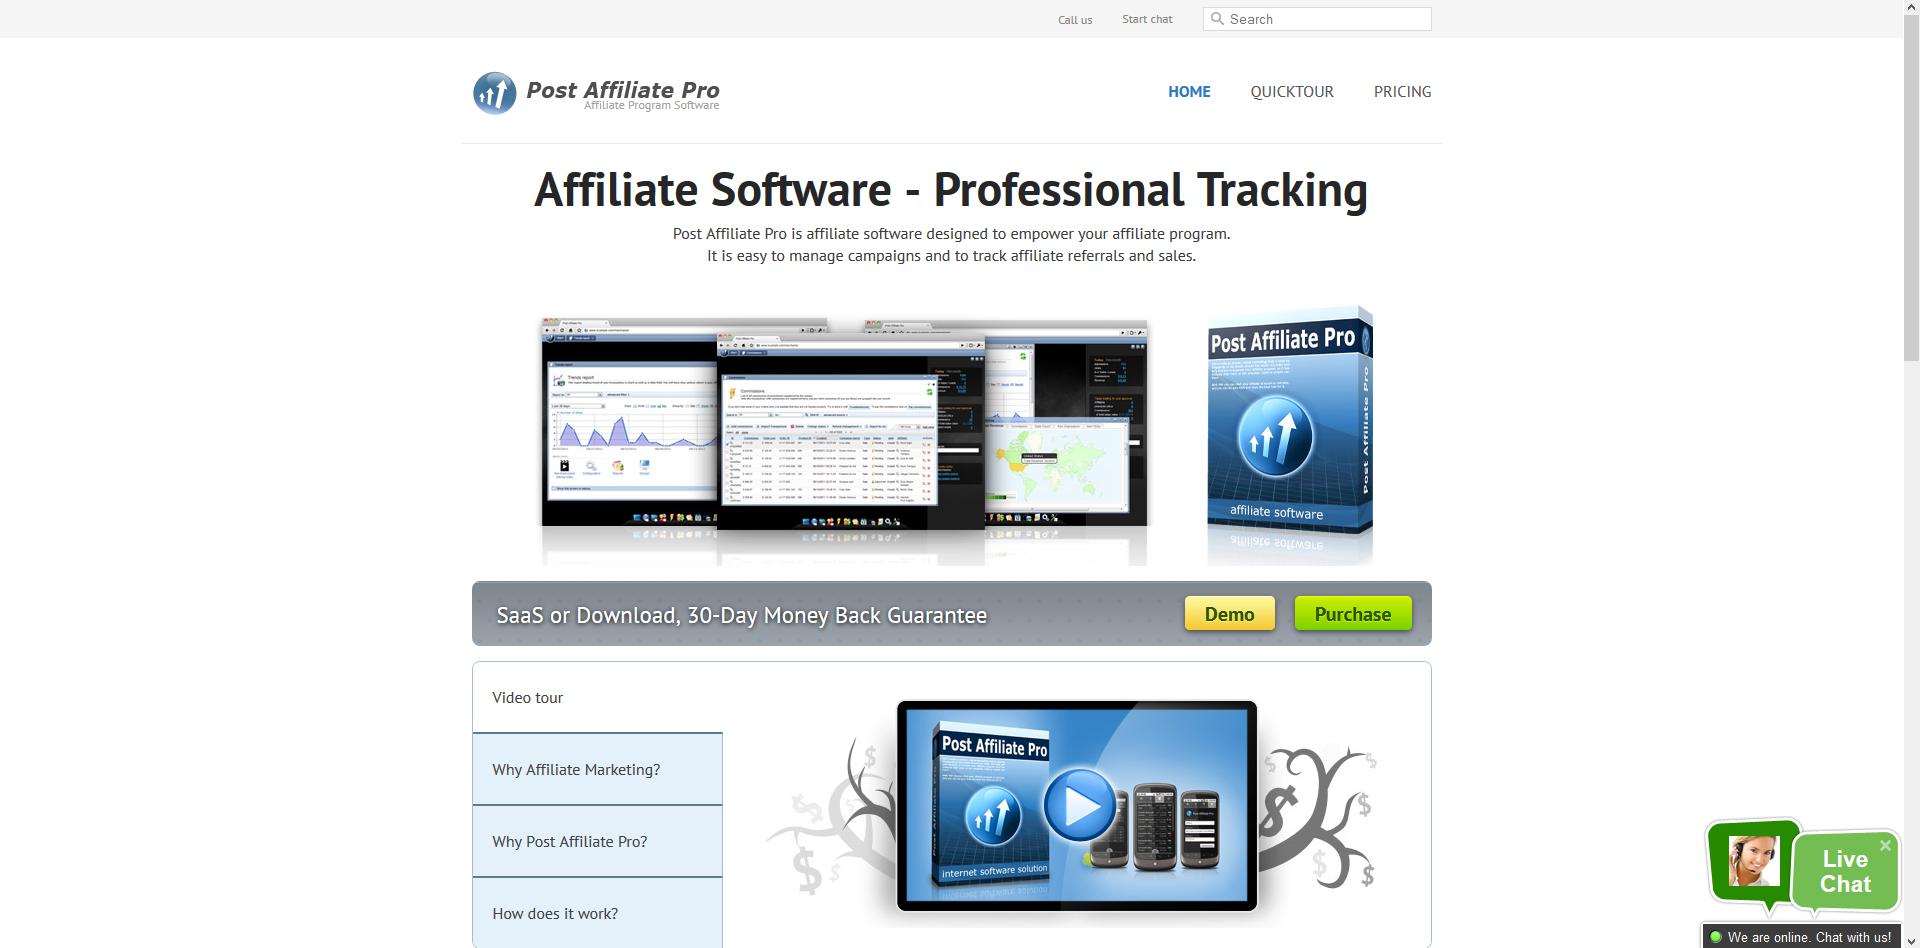 Post Affiliate Pro 4 Website